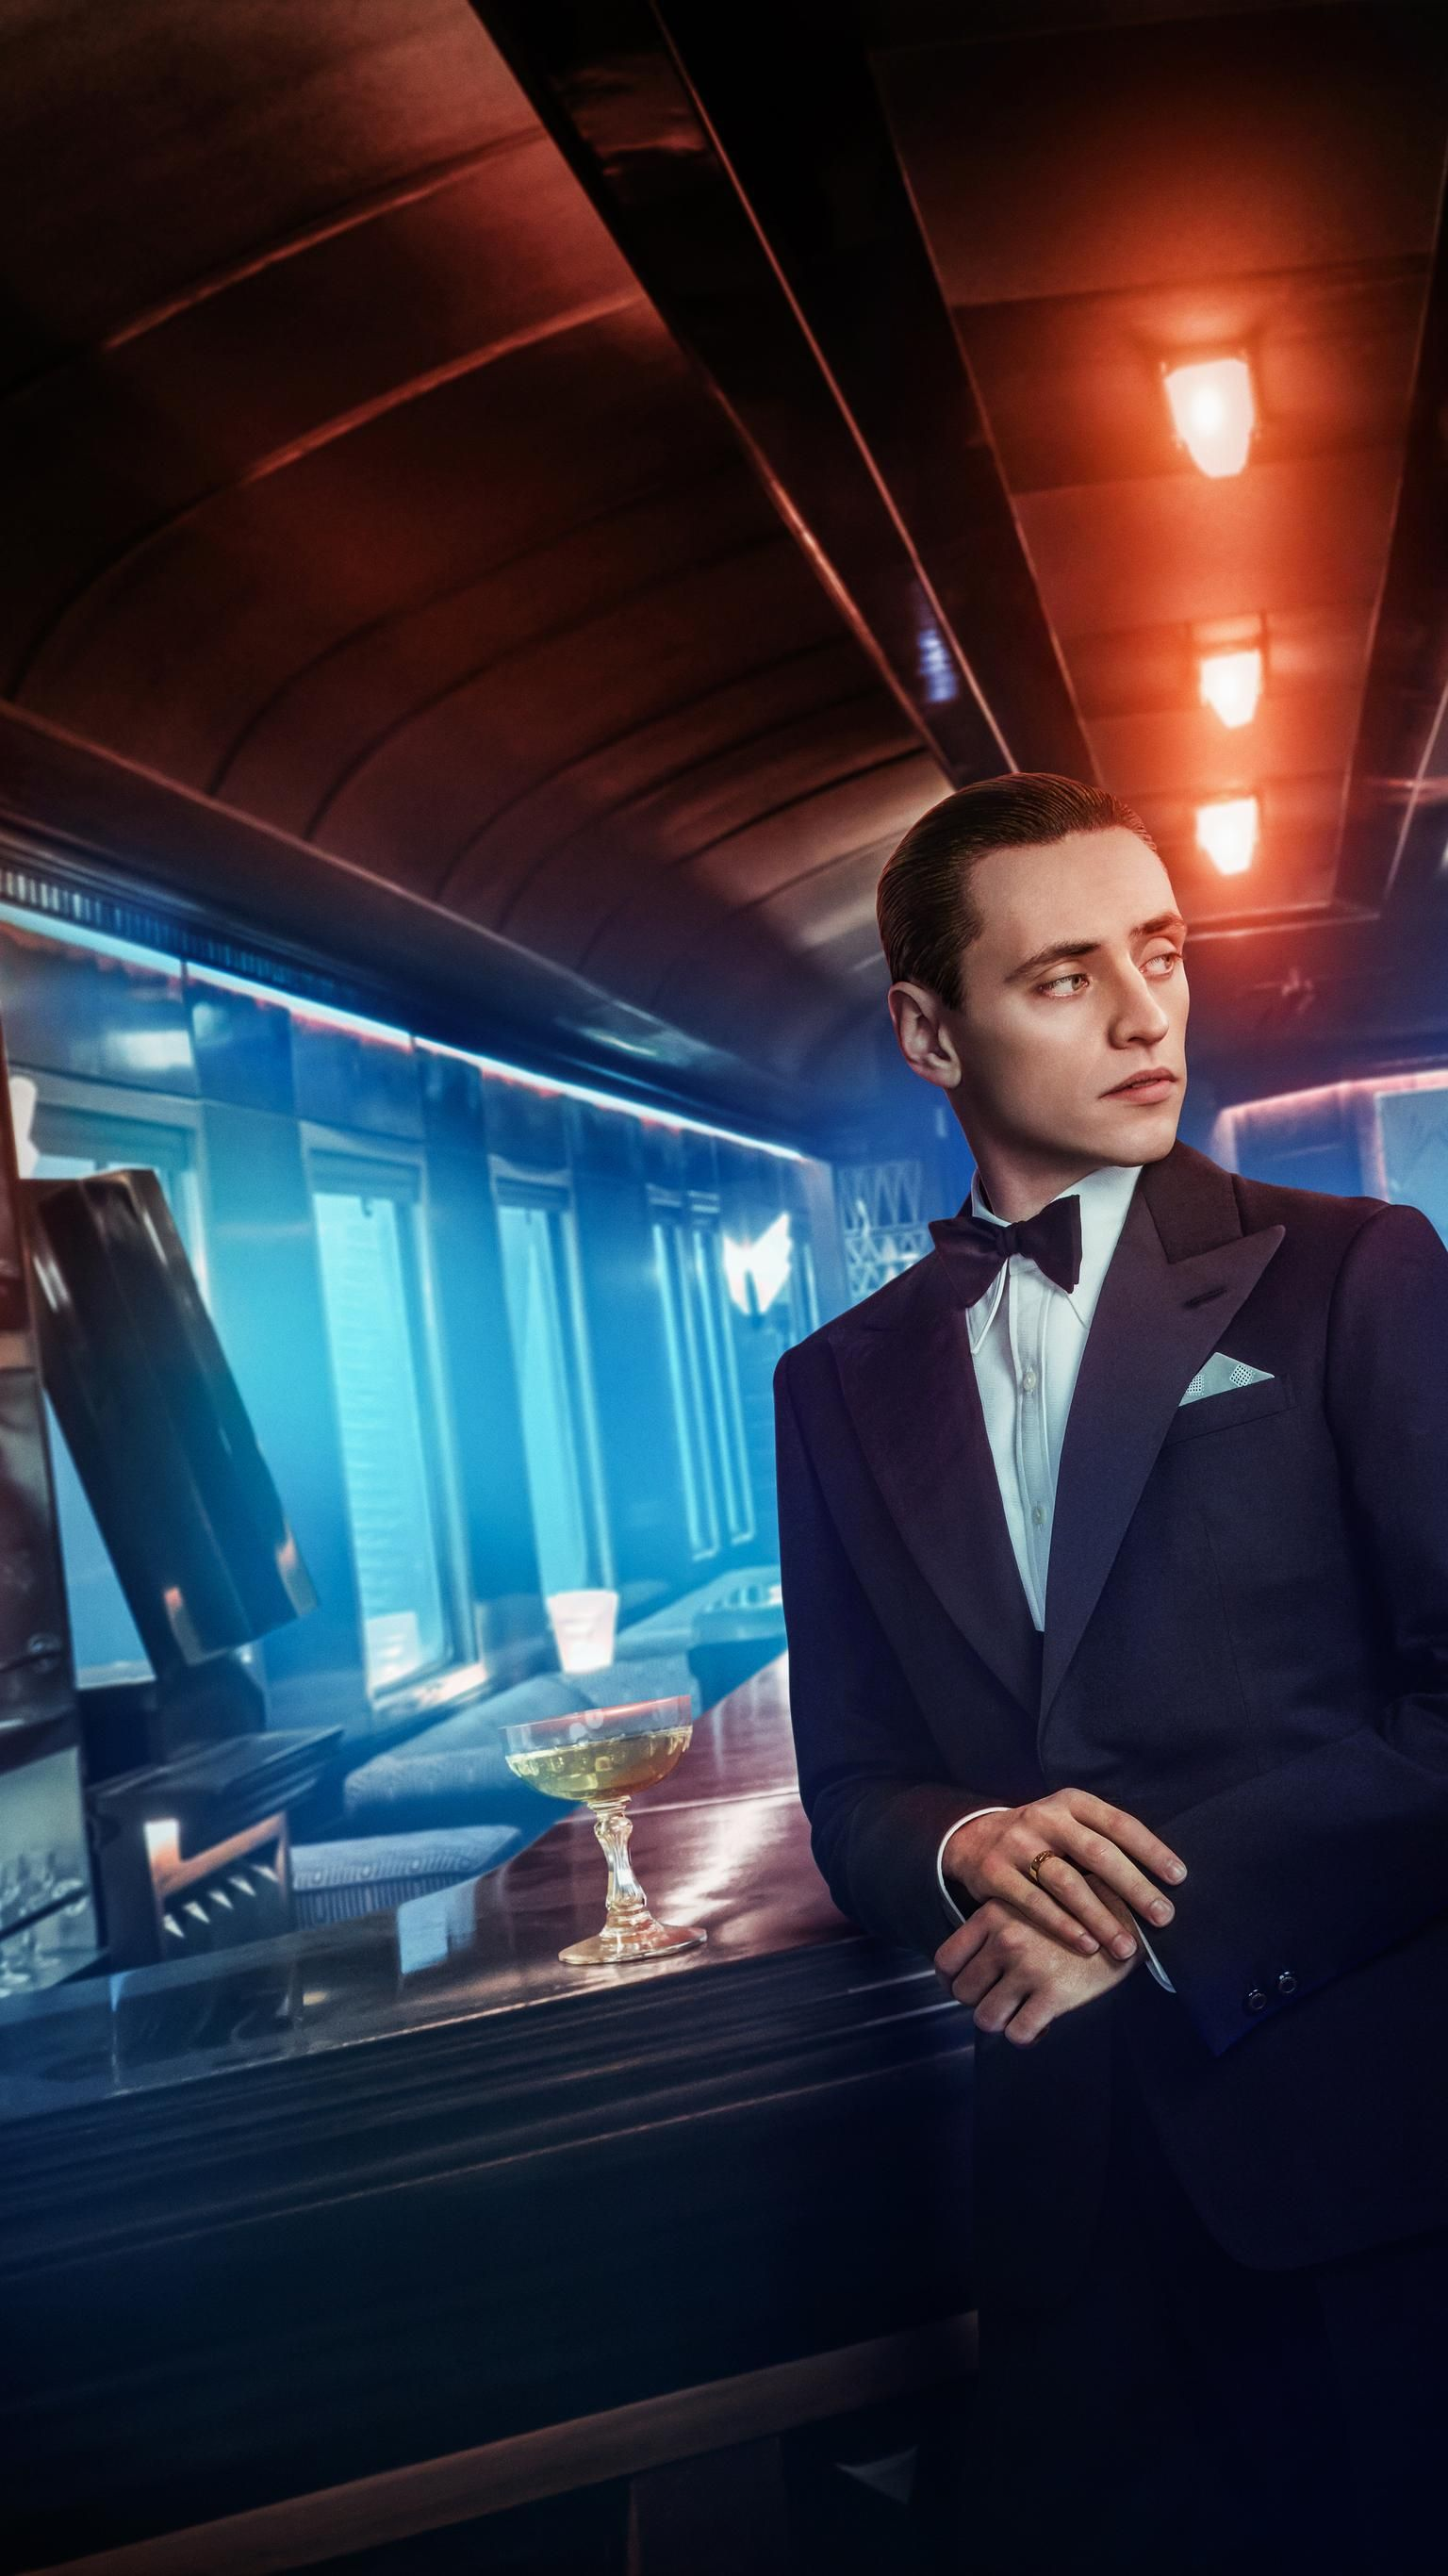 Le Crime De L'orient Express Streaming Vf : crime, l'orient, express, streaming, Movie